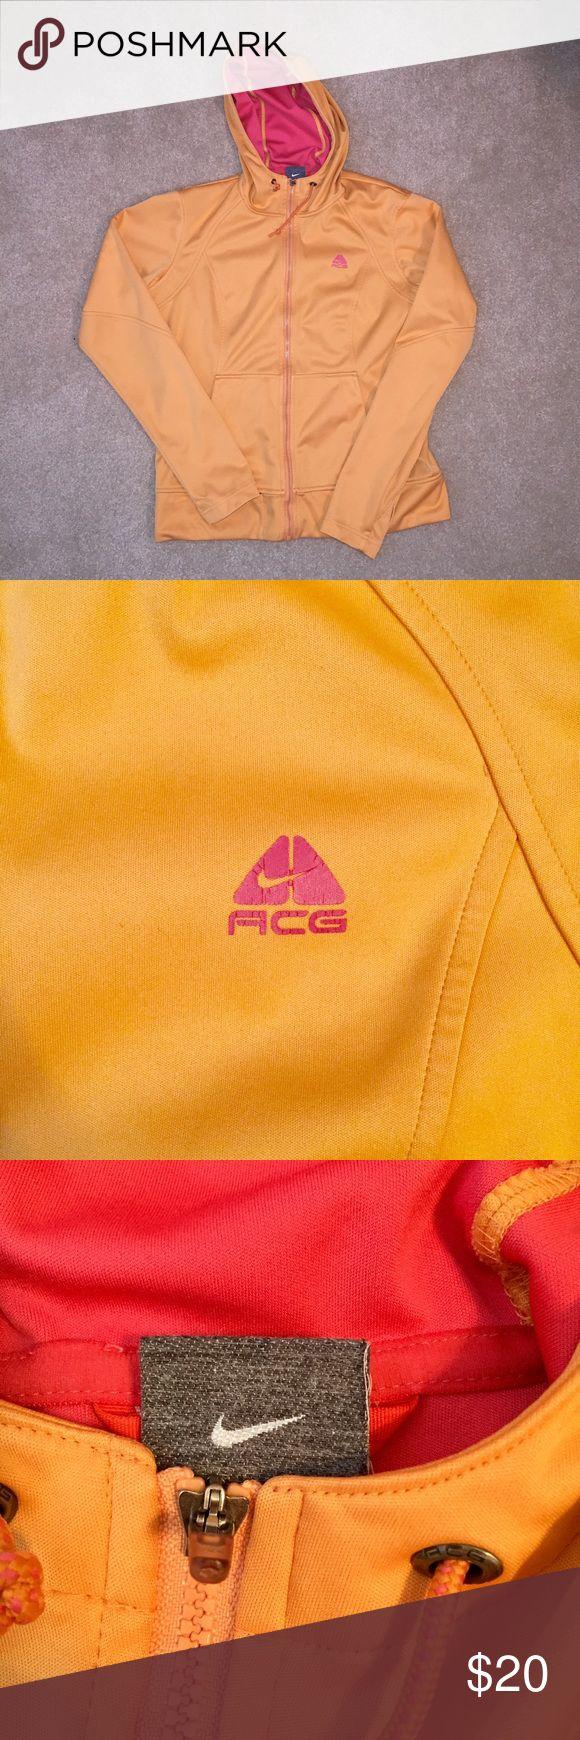 Nike ACG Orange and Pink Running Jacket Great condition! Has thumb holes! Nike ACG Jackets & Coats